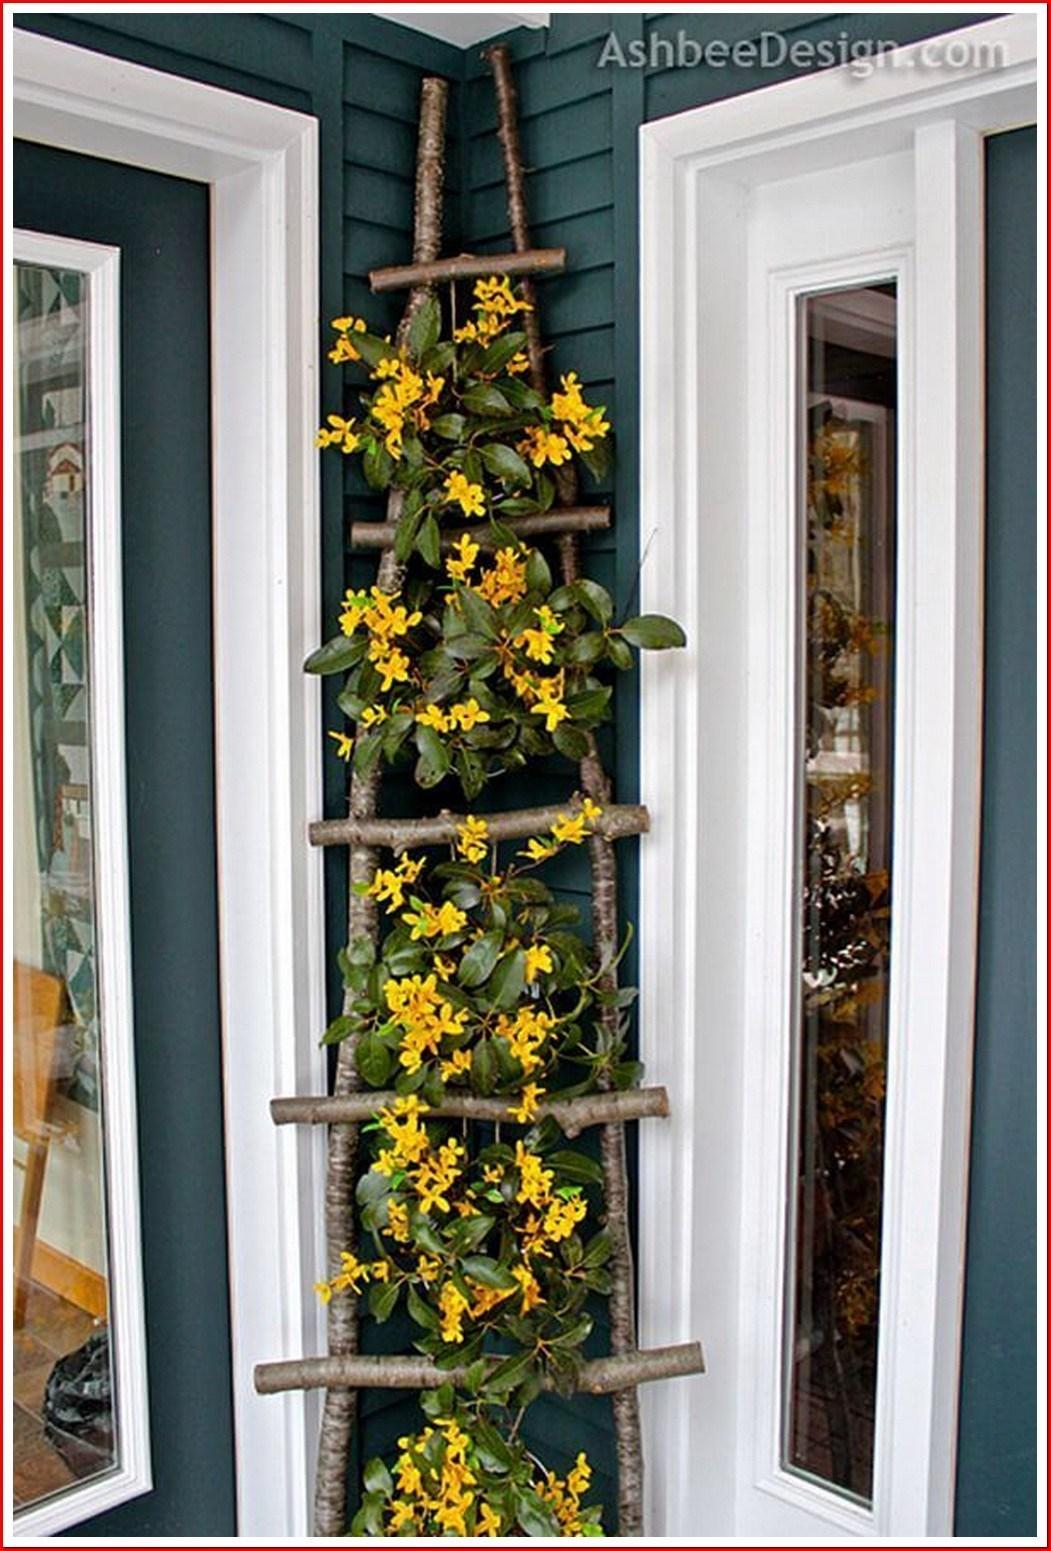 Diy trellis ladder Functional DIY Trellis Ideas To Beautify Your Garden In Style